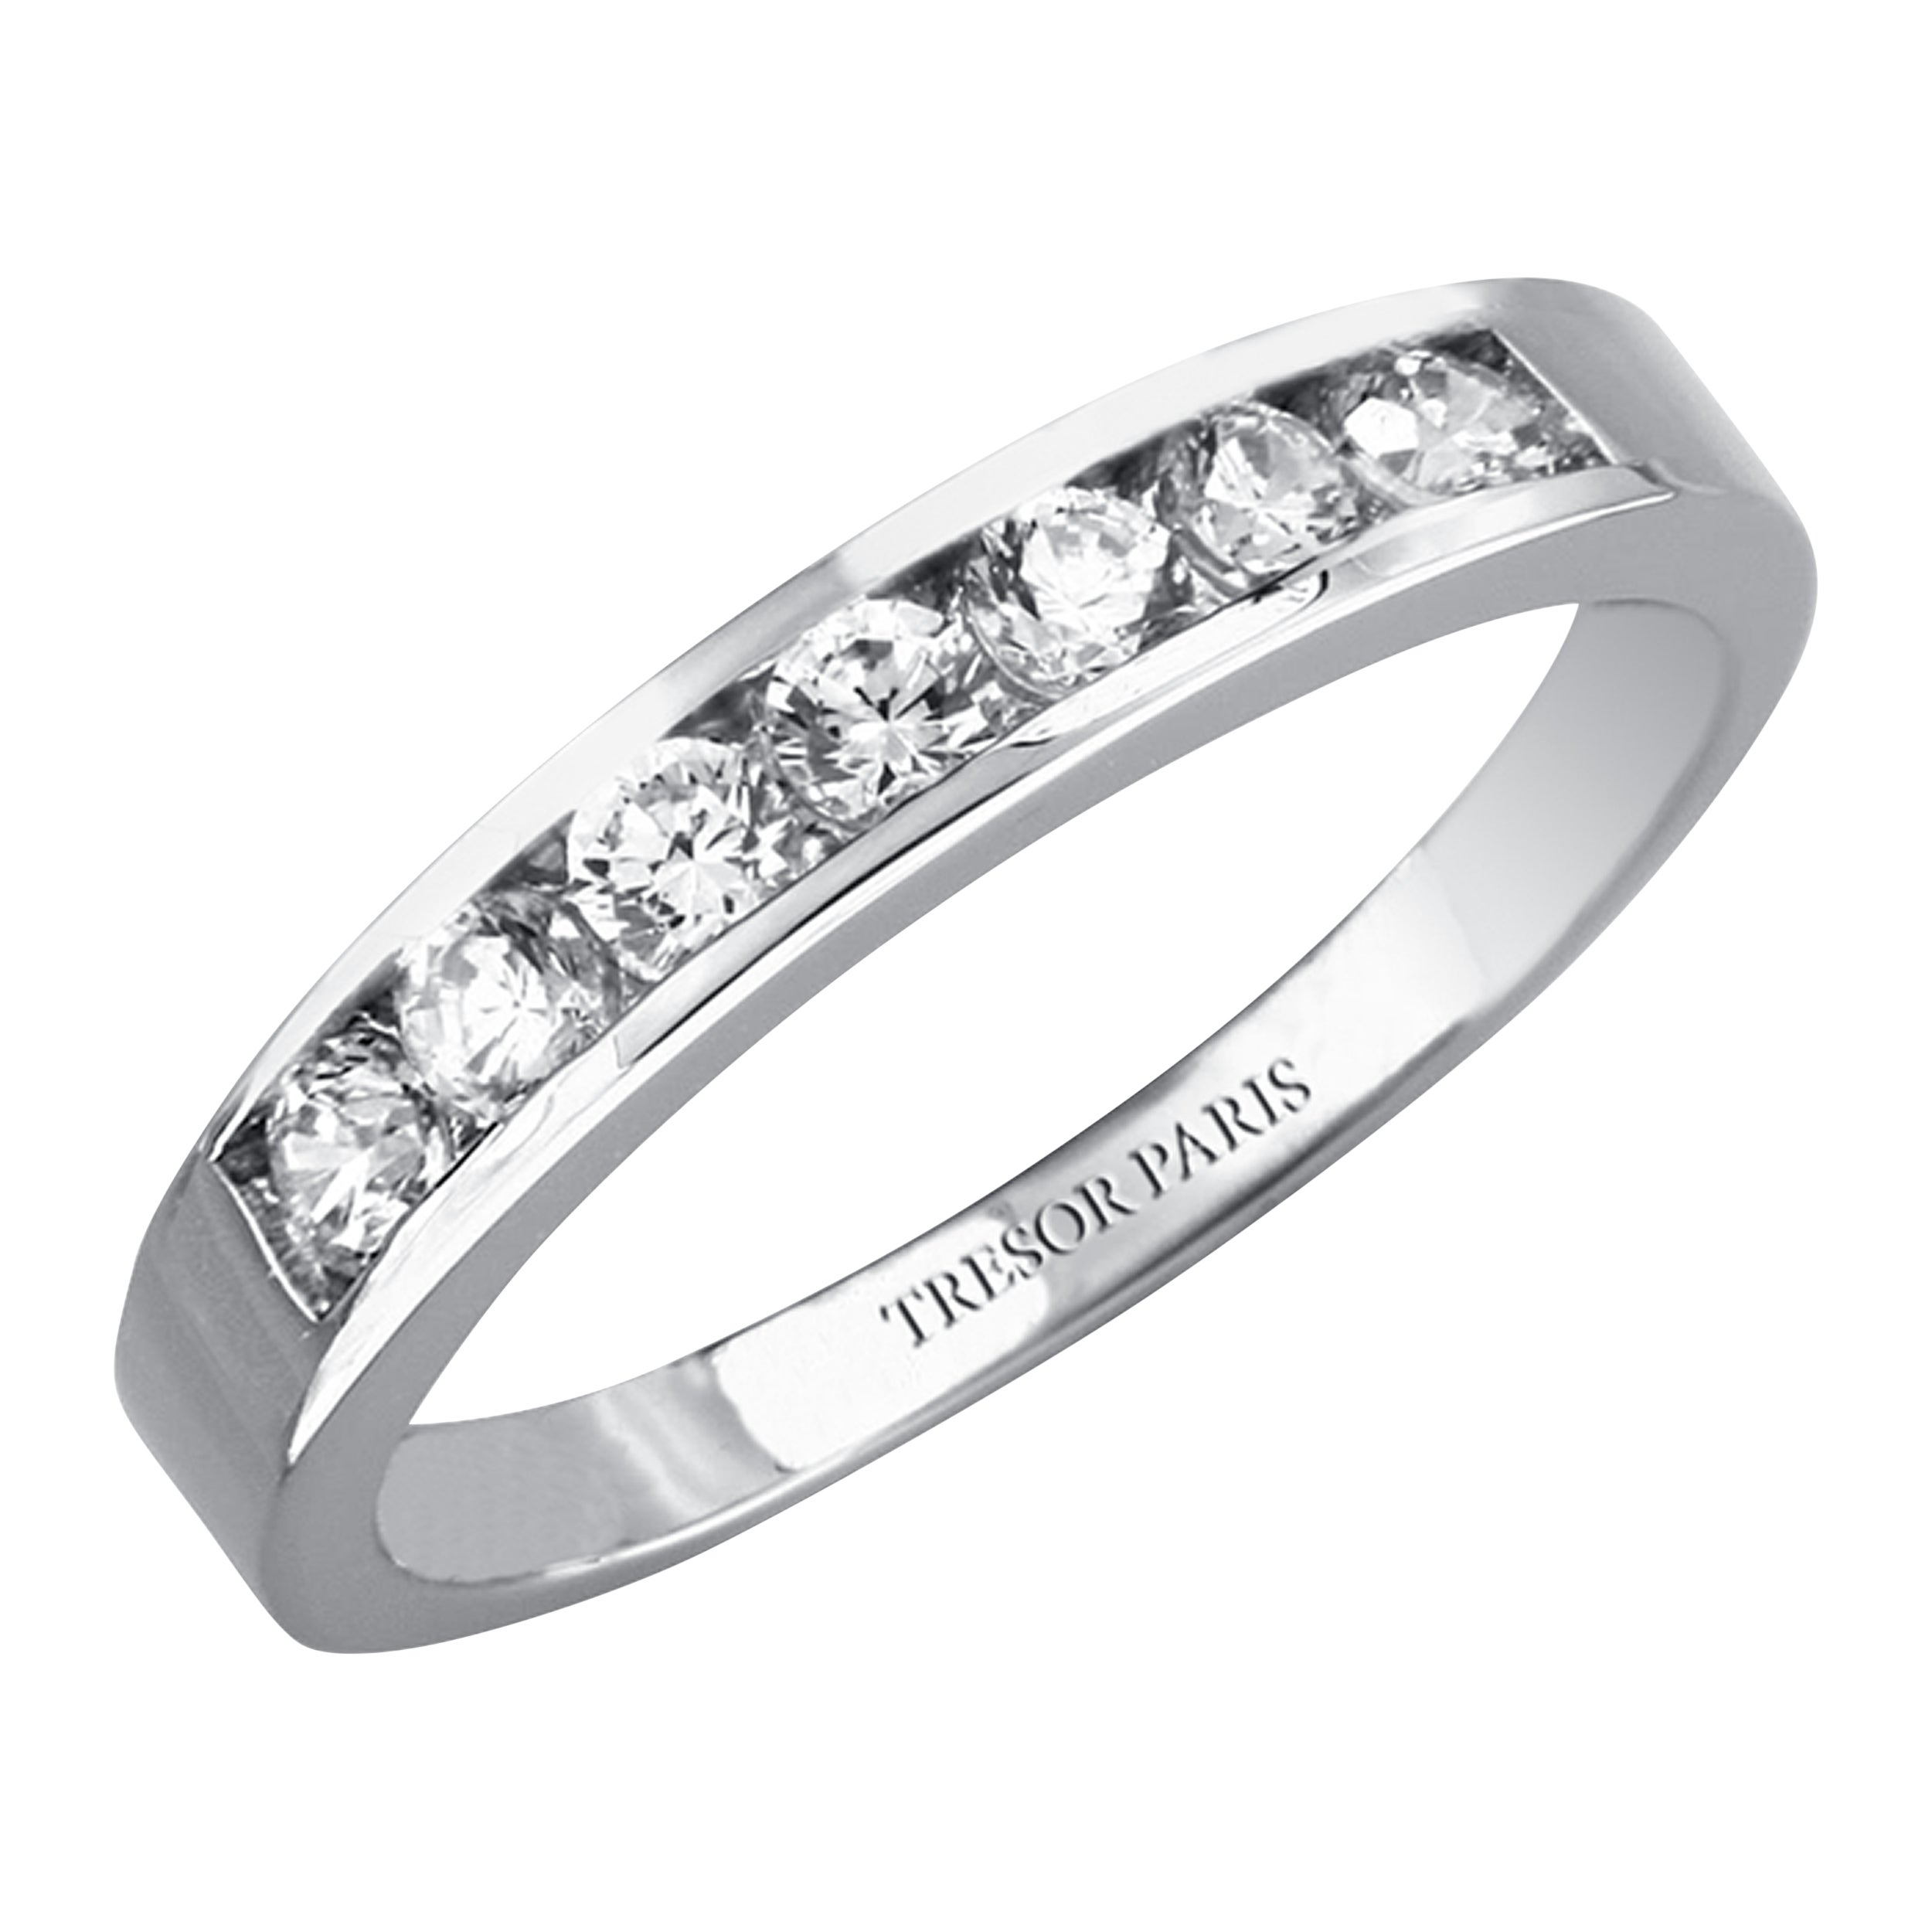 0.75 Carat Round Diamond Channel Set 18 Karat White Gold Half Eternity Band Ring